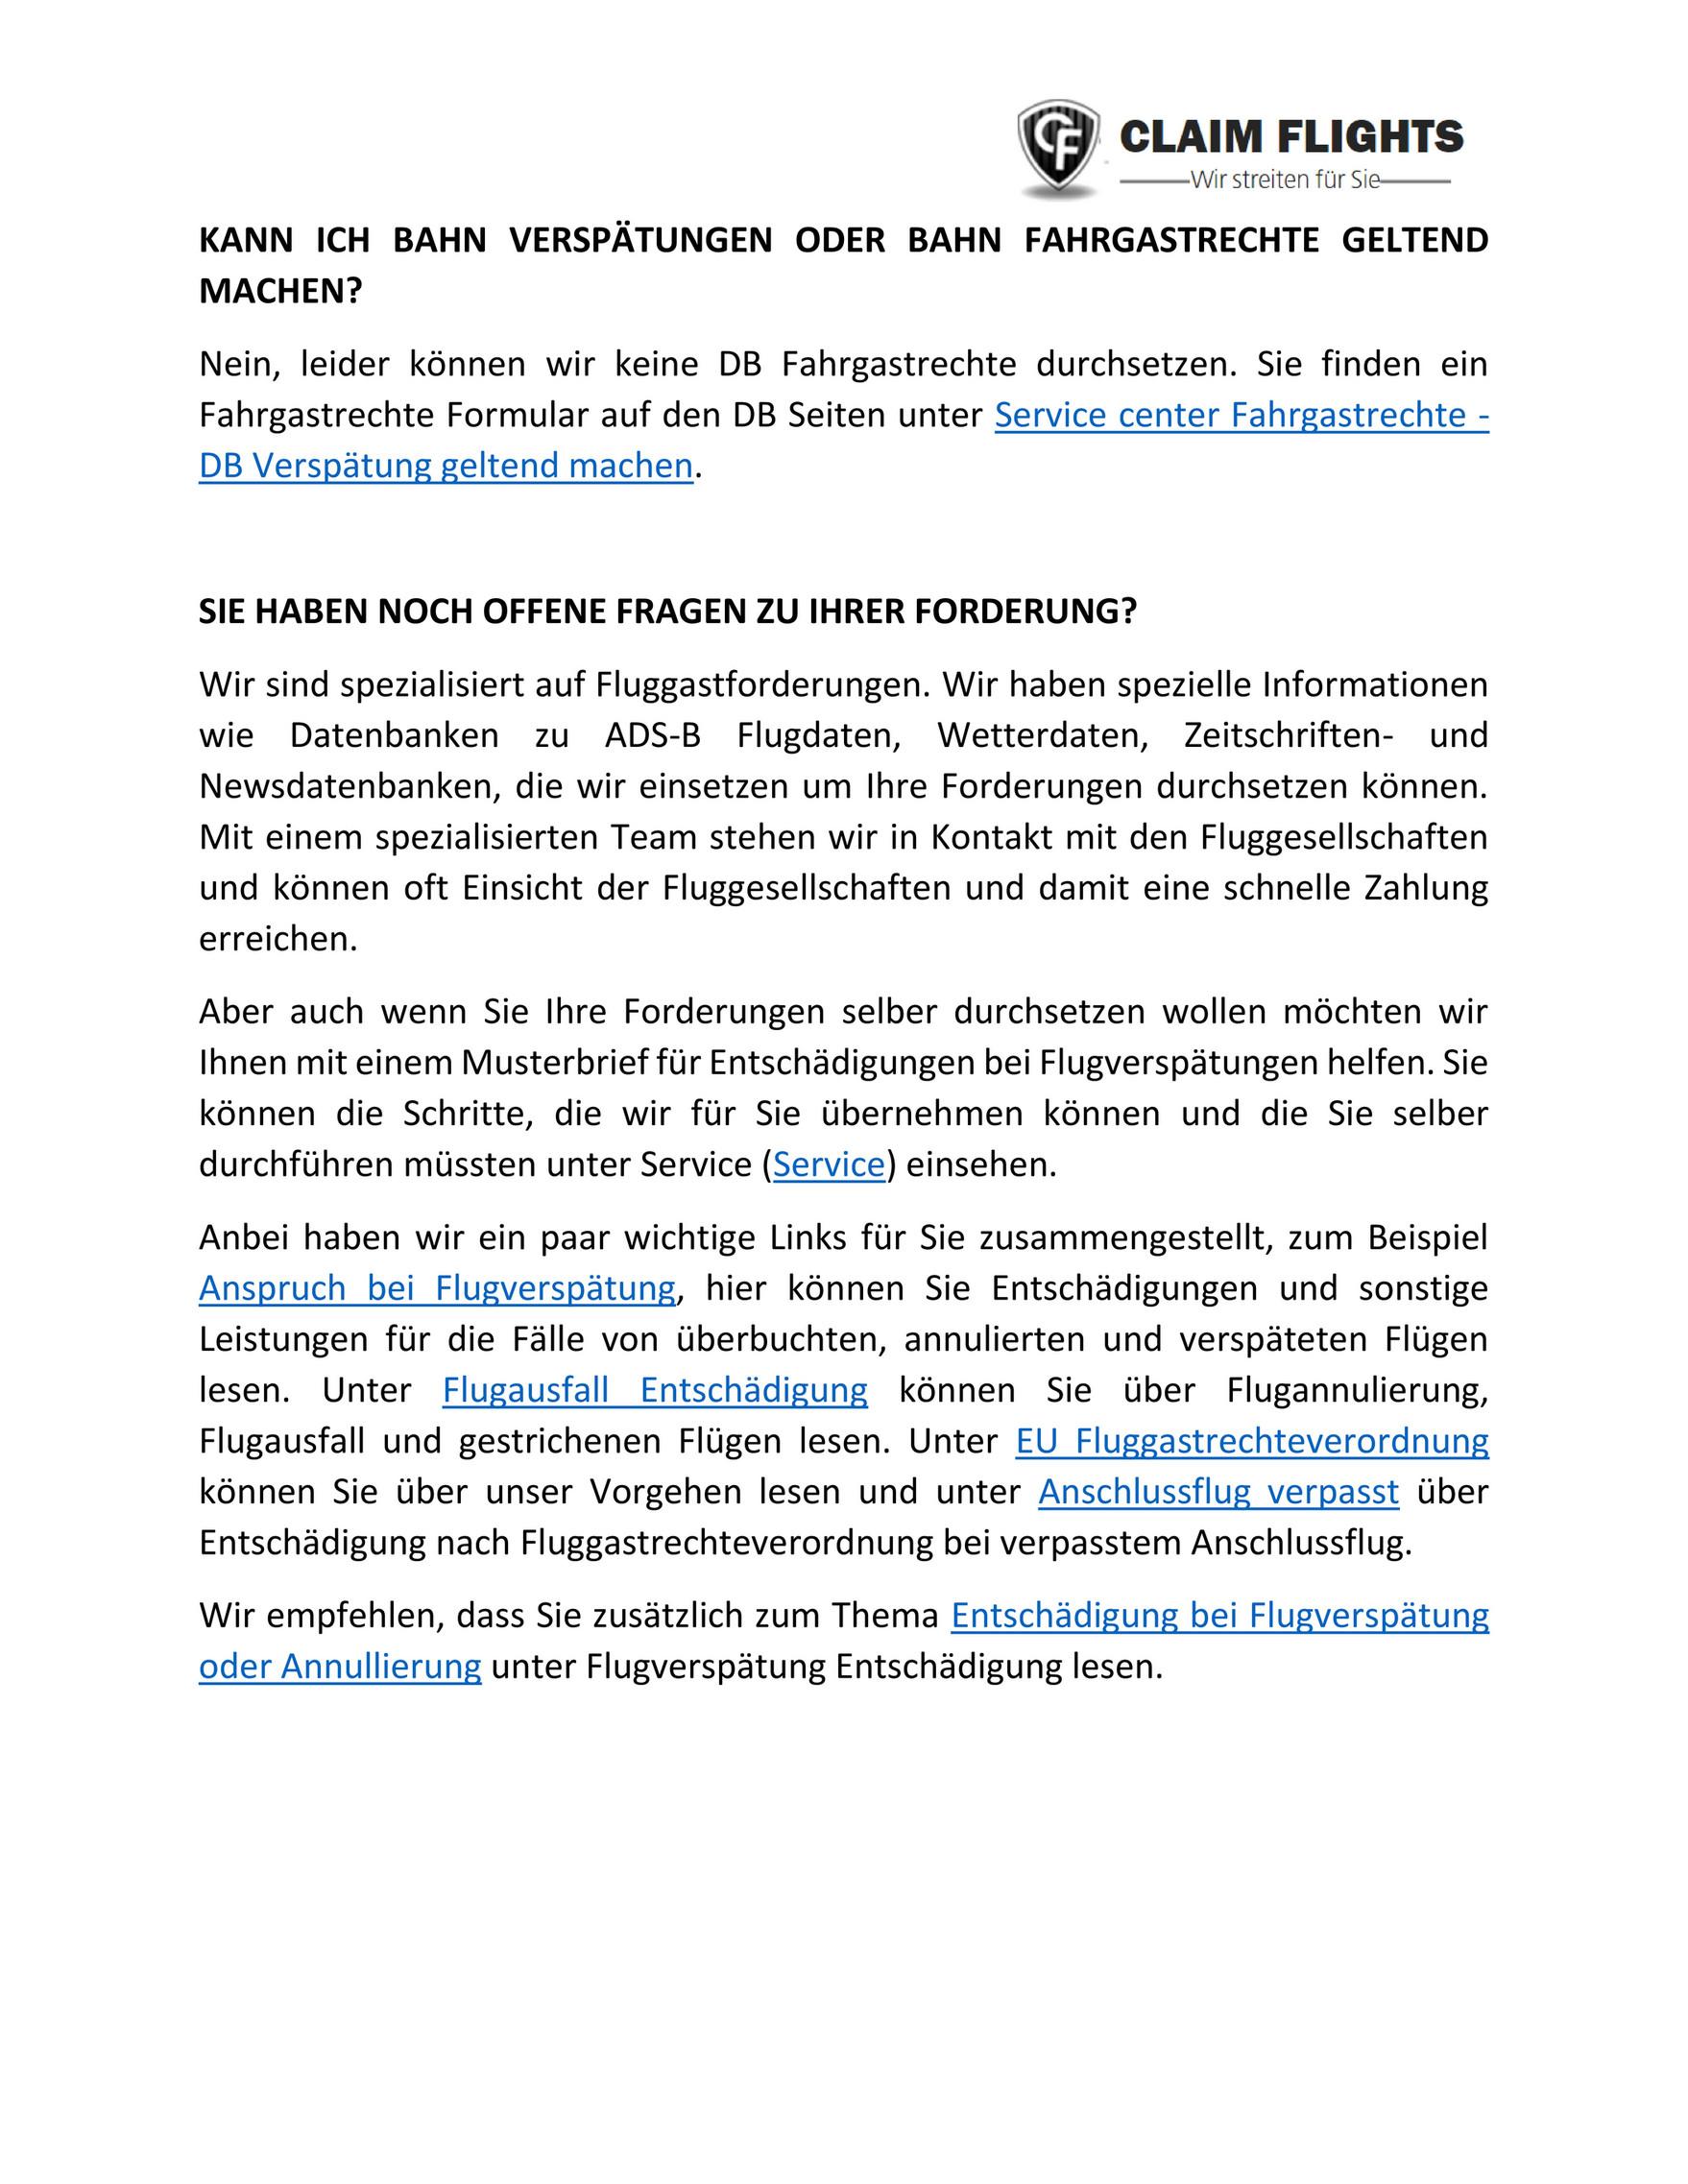 Eurowings Entschadigung Flugverspatung Flugausfall 9